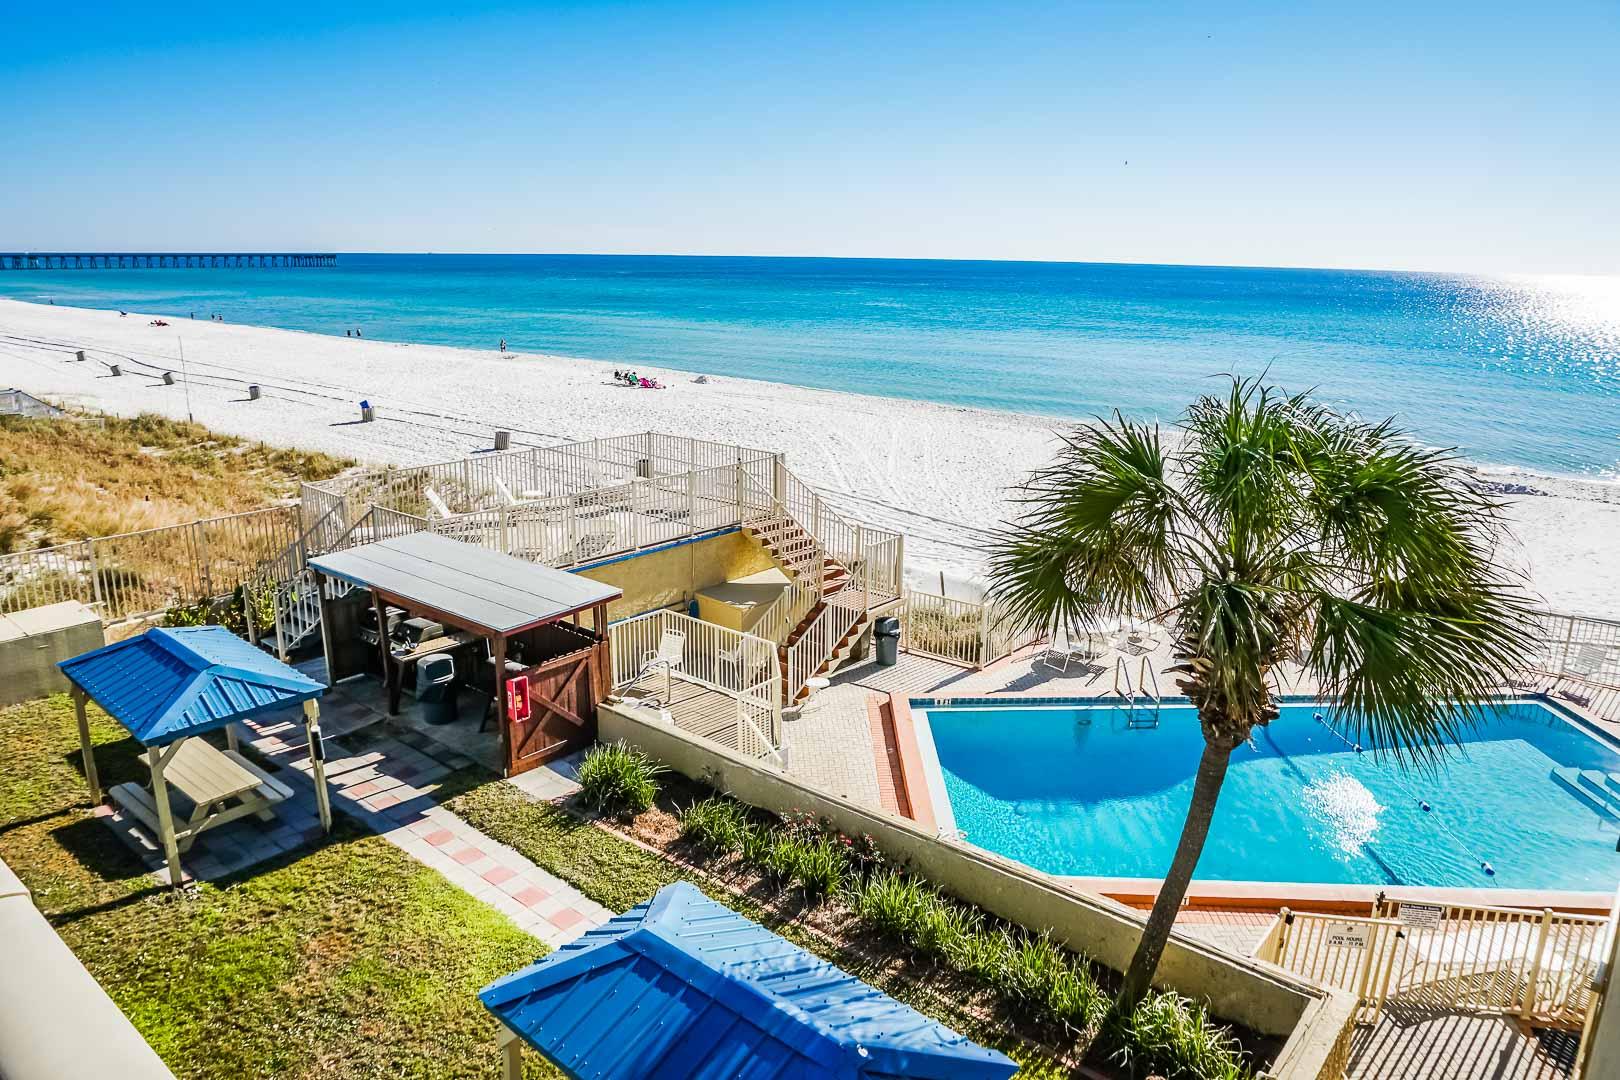 A crisp pool with beach access at VRI's Panama City Resort & Club in Florida.